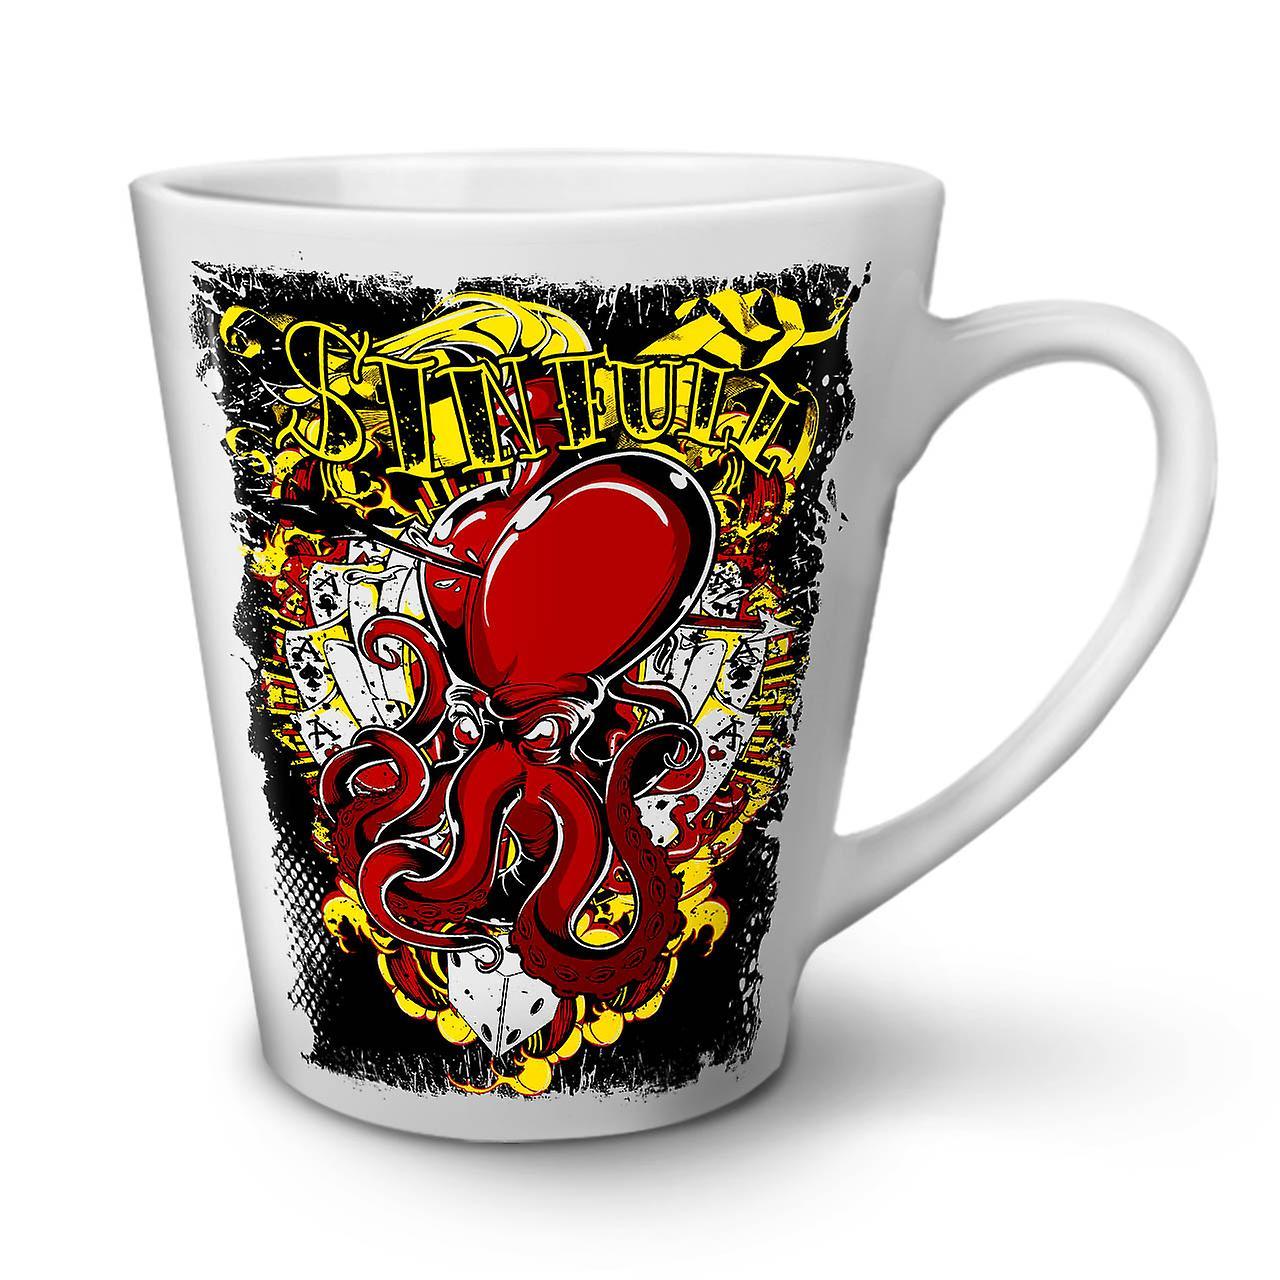 Card 12 White Sinful Gamble New Tea Mug Ceramic Latte Poker OzWellcoda Coffee LSpMzqjVGU